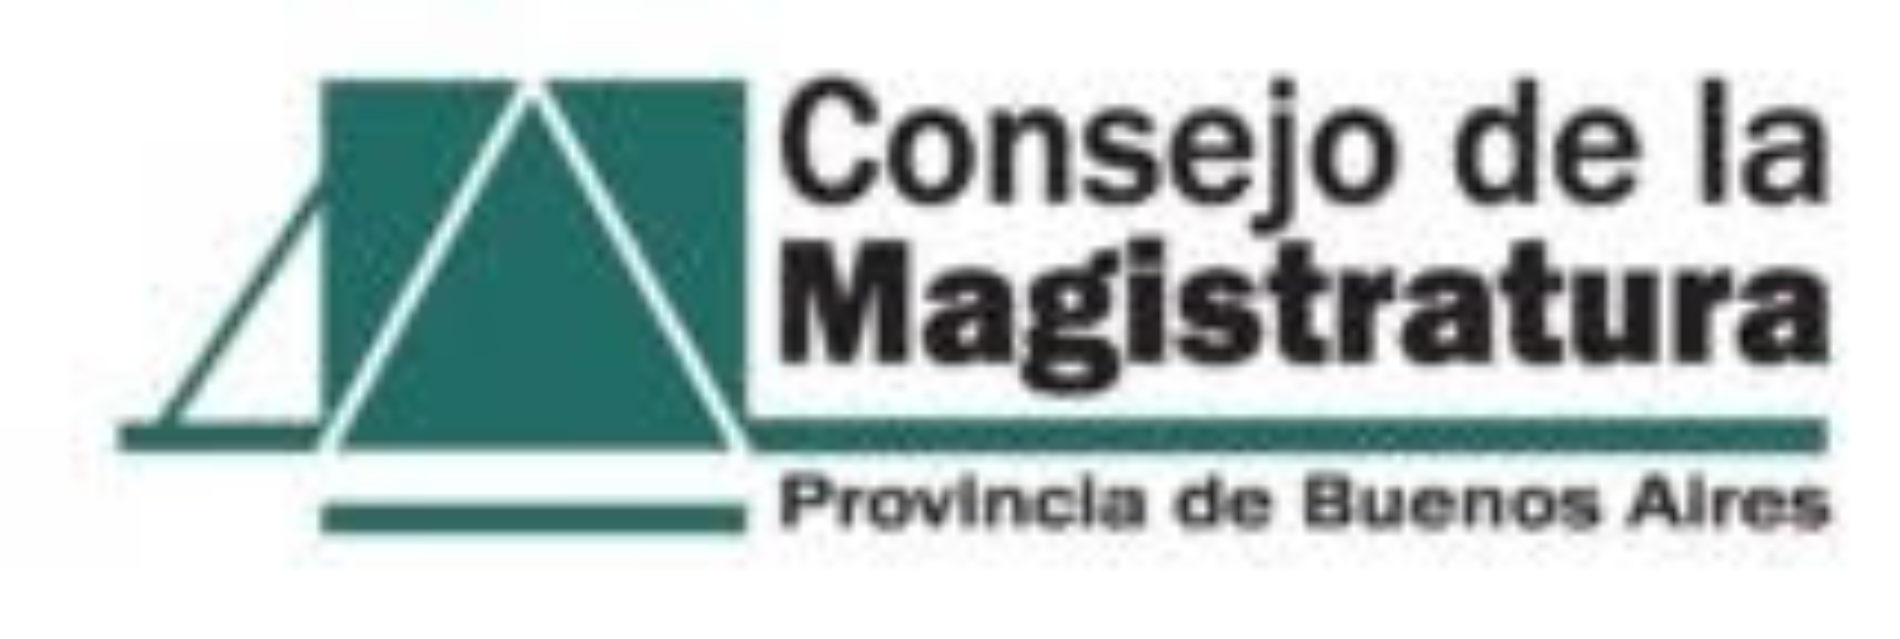 «Consejo de la Magistratura de la Provincia de Buenos Aires». Convocatoria Nro. 3.